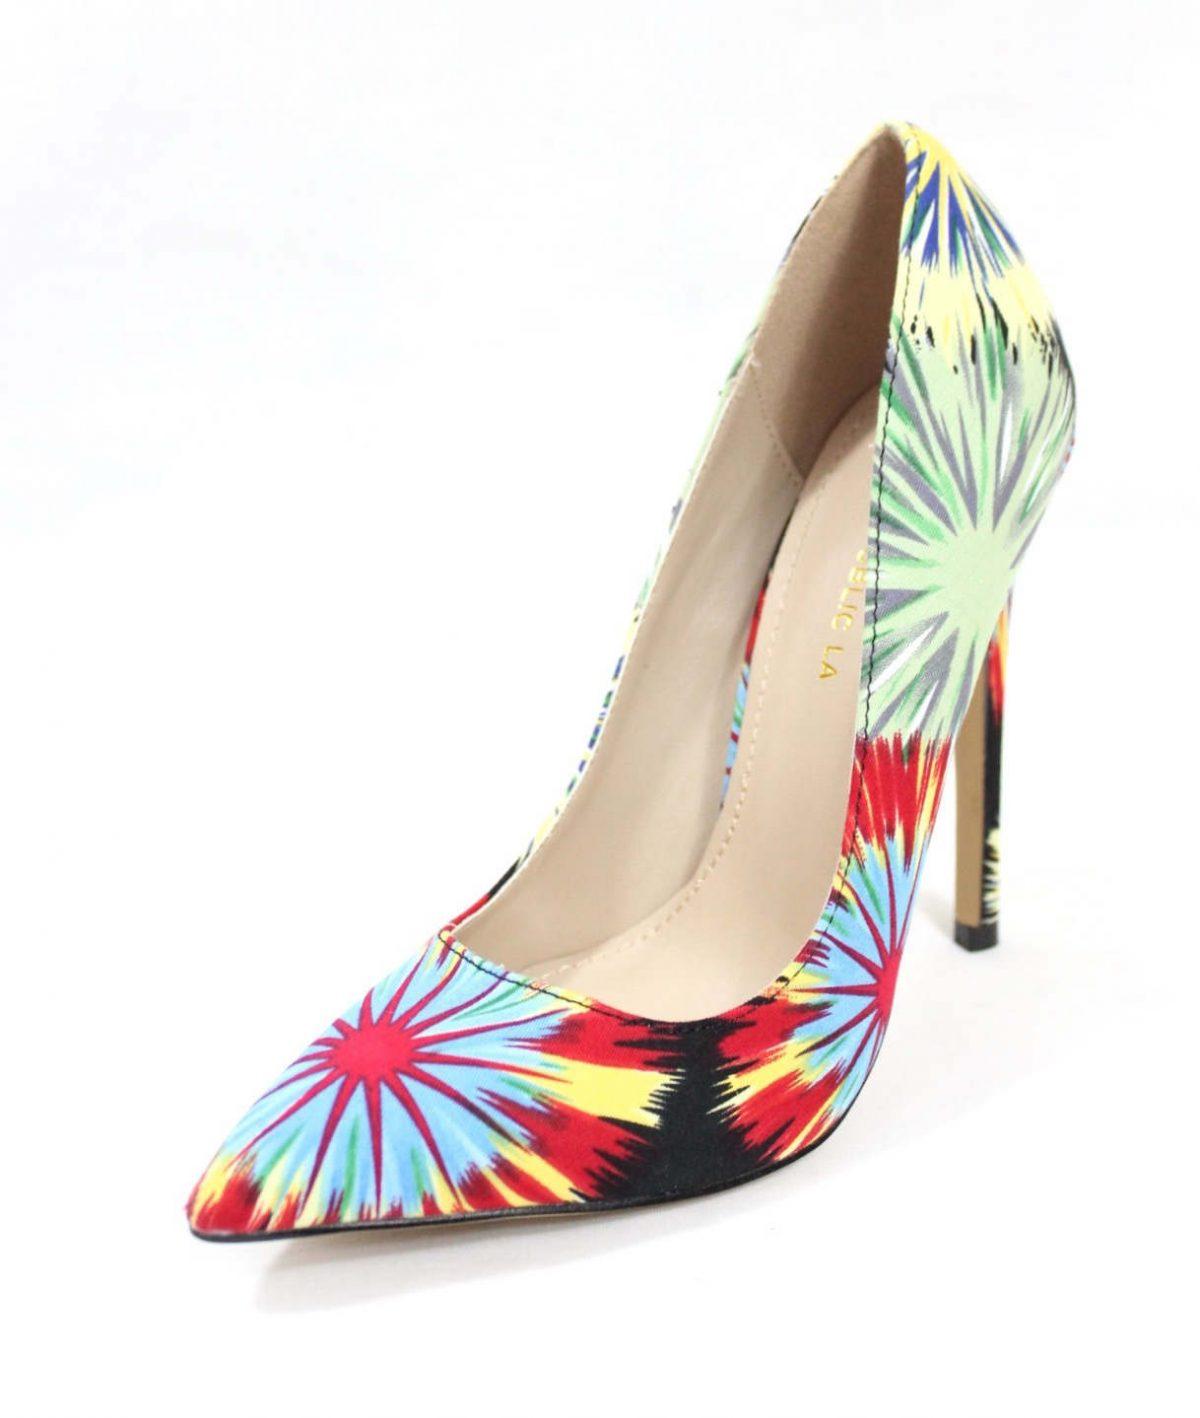 Shoe Republic Cajun Black Pointy Toe Pumps-4534